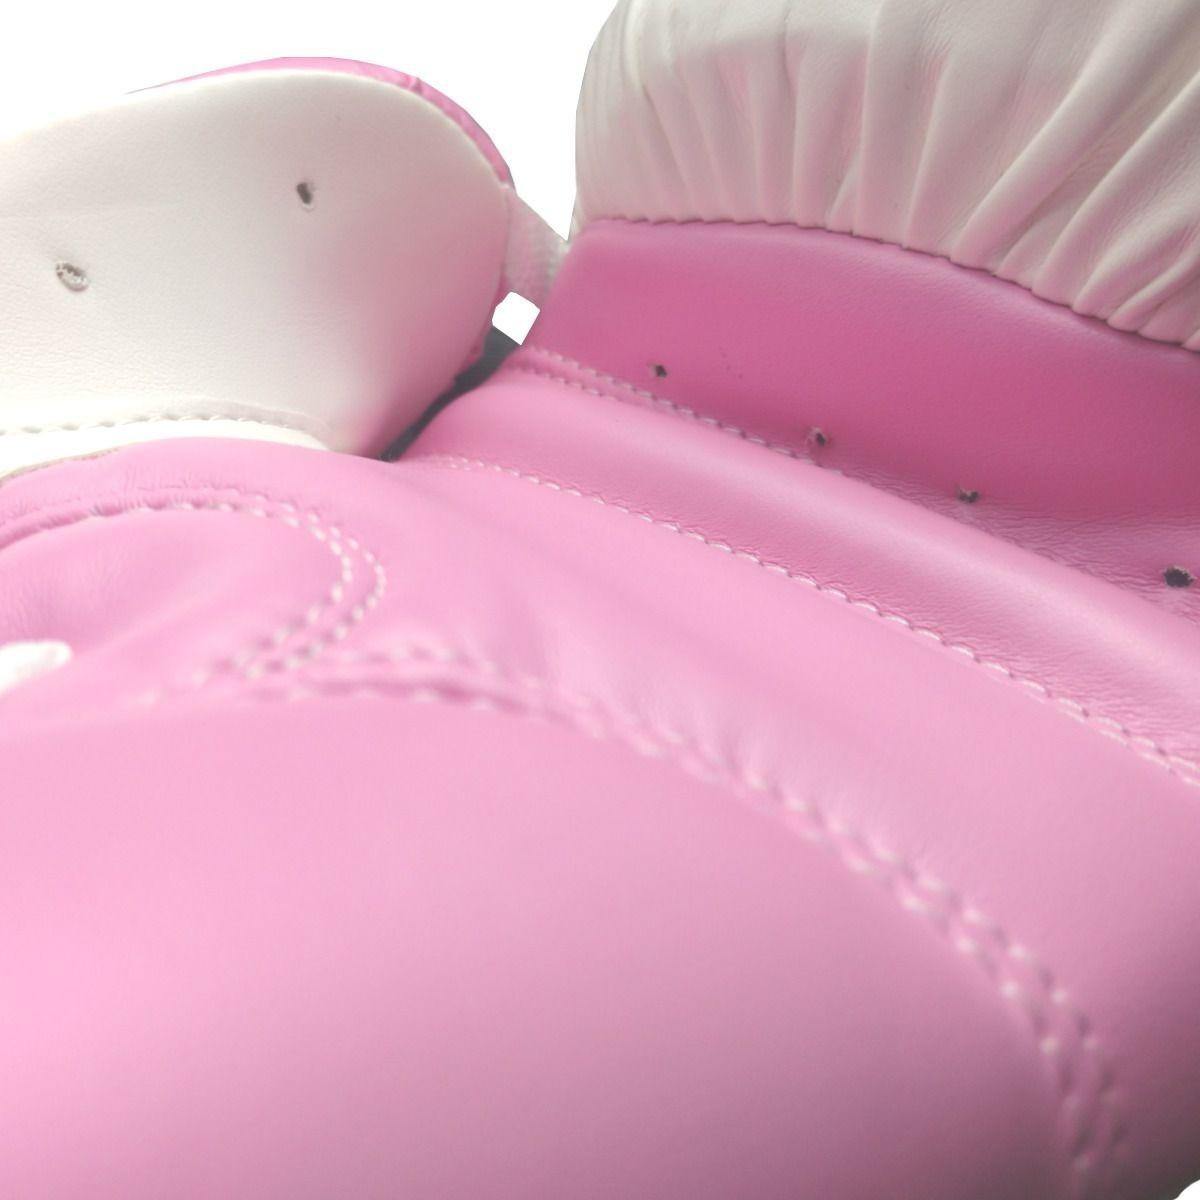 Luvas Boxe / Muay Thai - Adidas Response - Branca / Rosa - 10 OZ  - Loja do Competidor